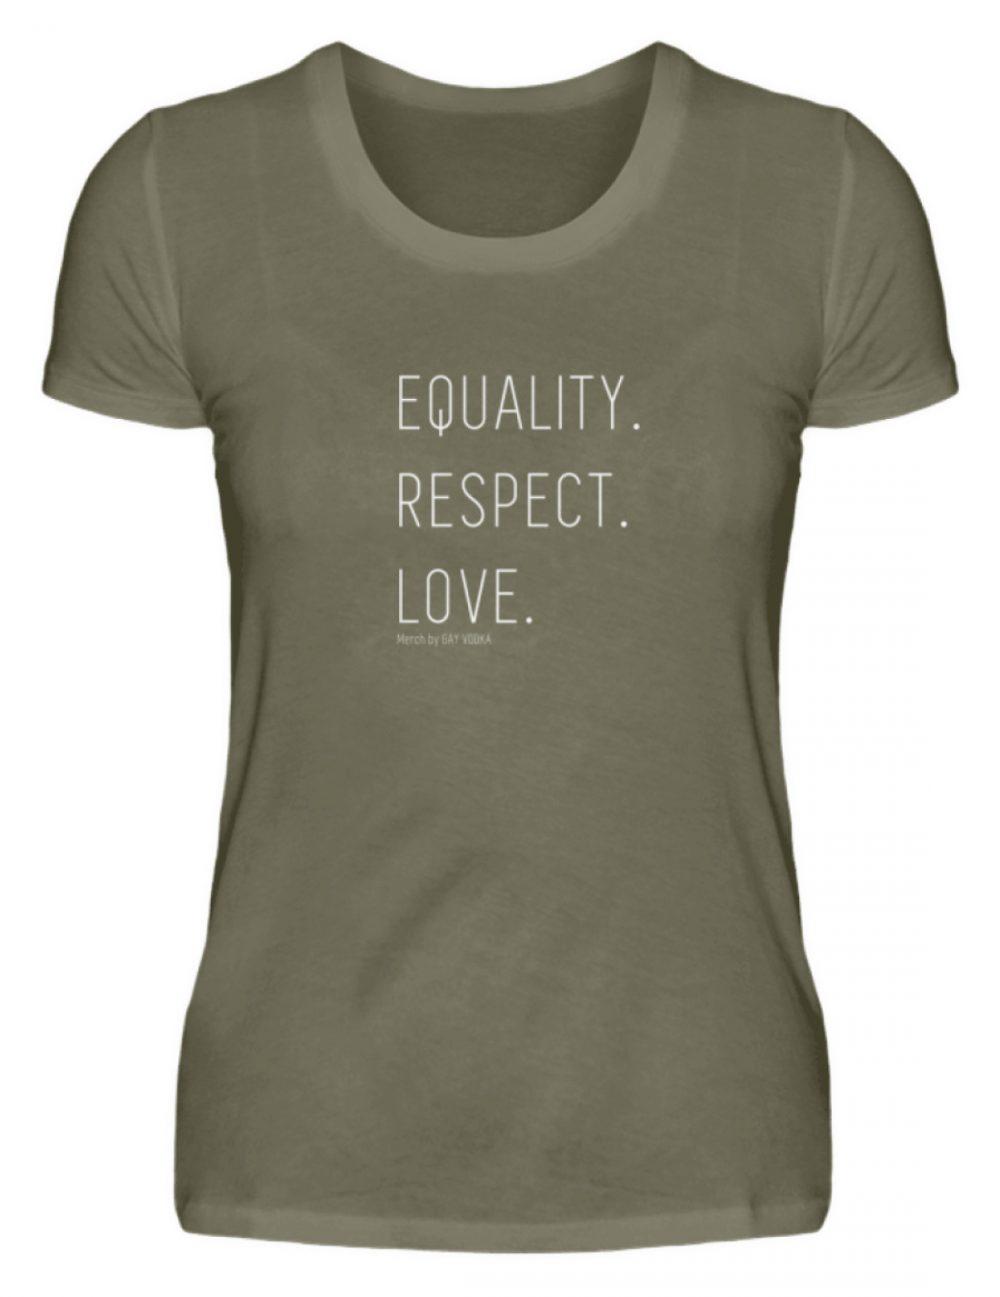 EQUALITY. RESPECT. LOVE. - Damen Premiumshirt-627